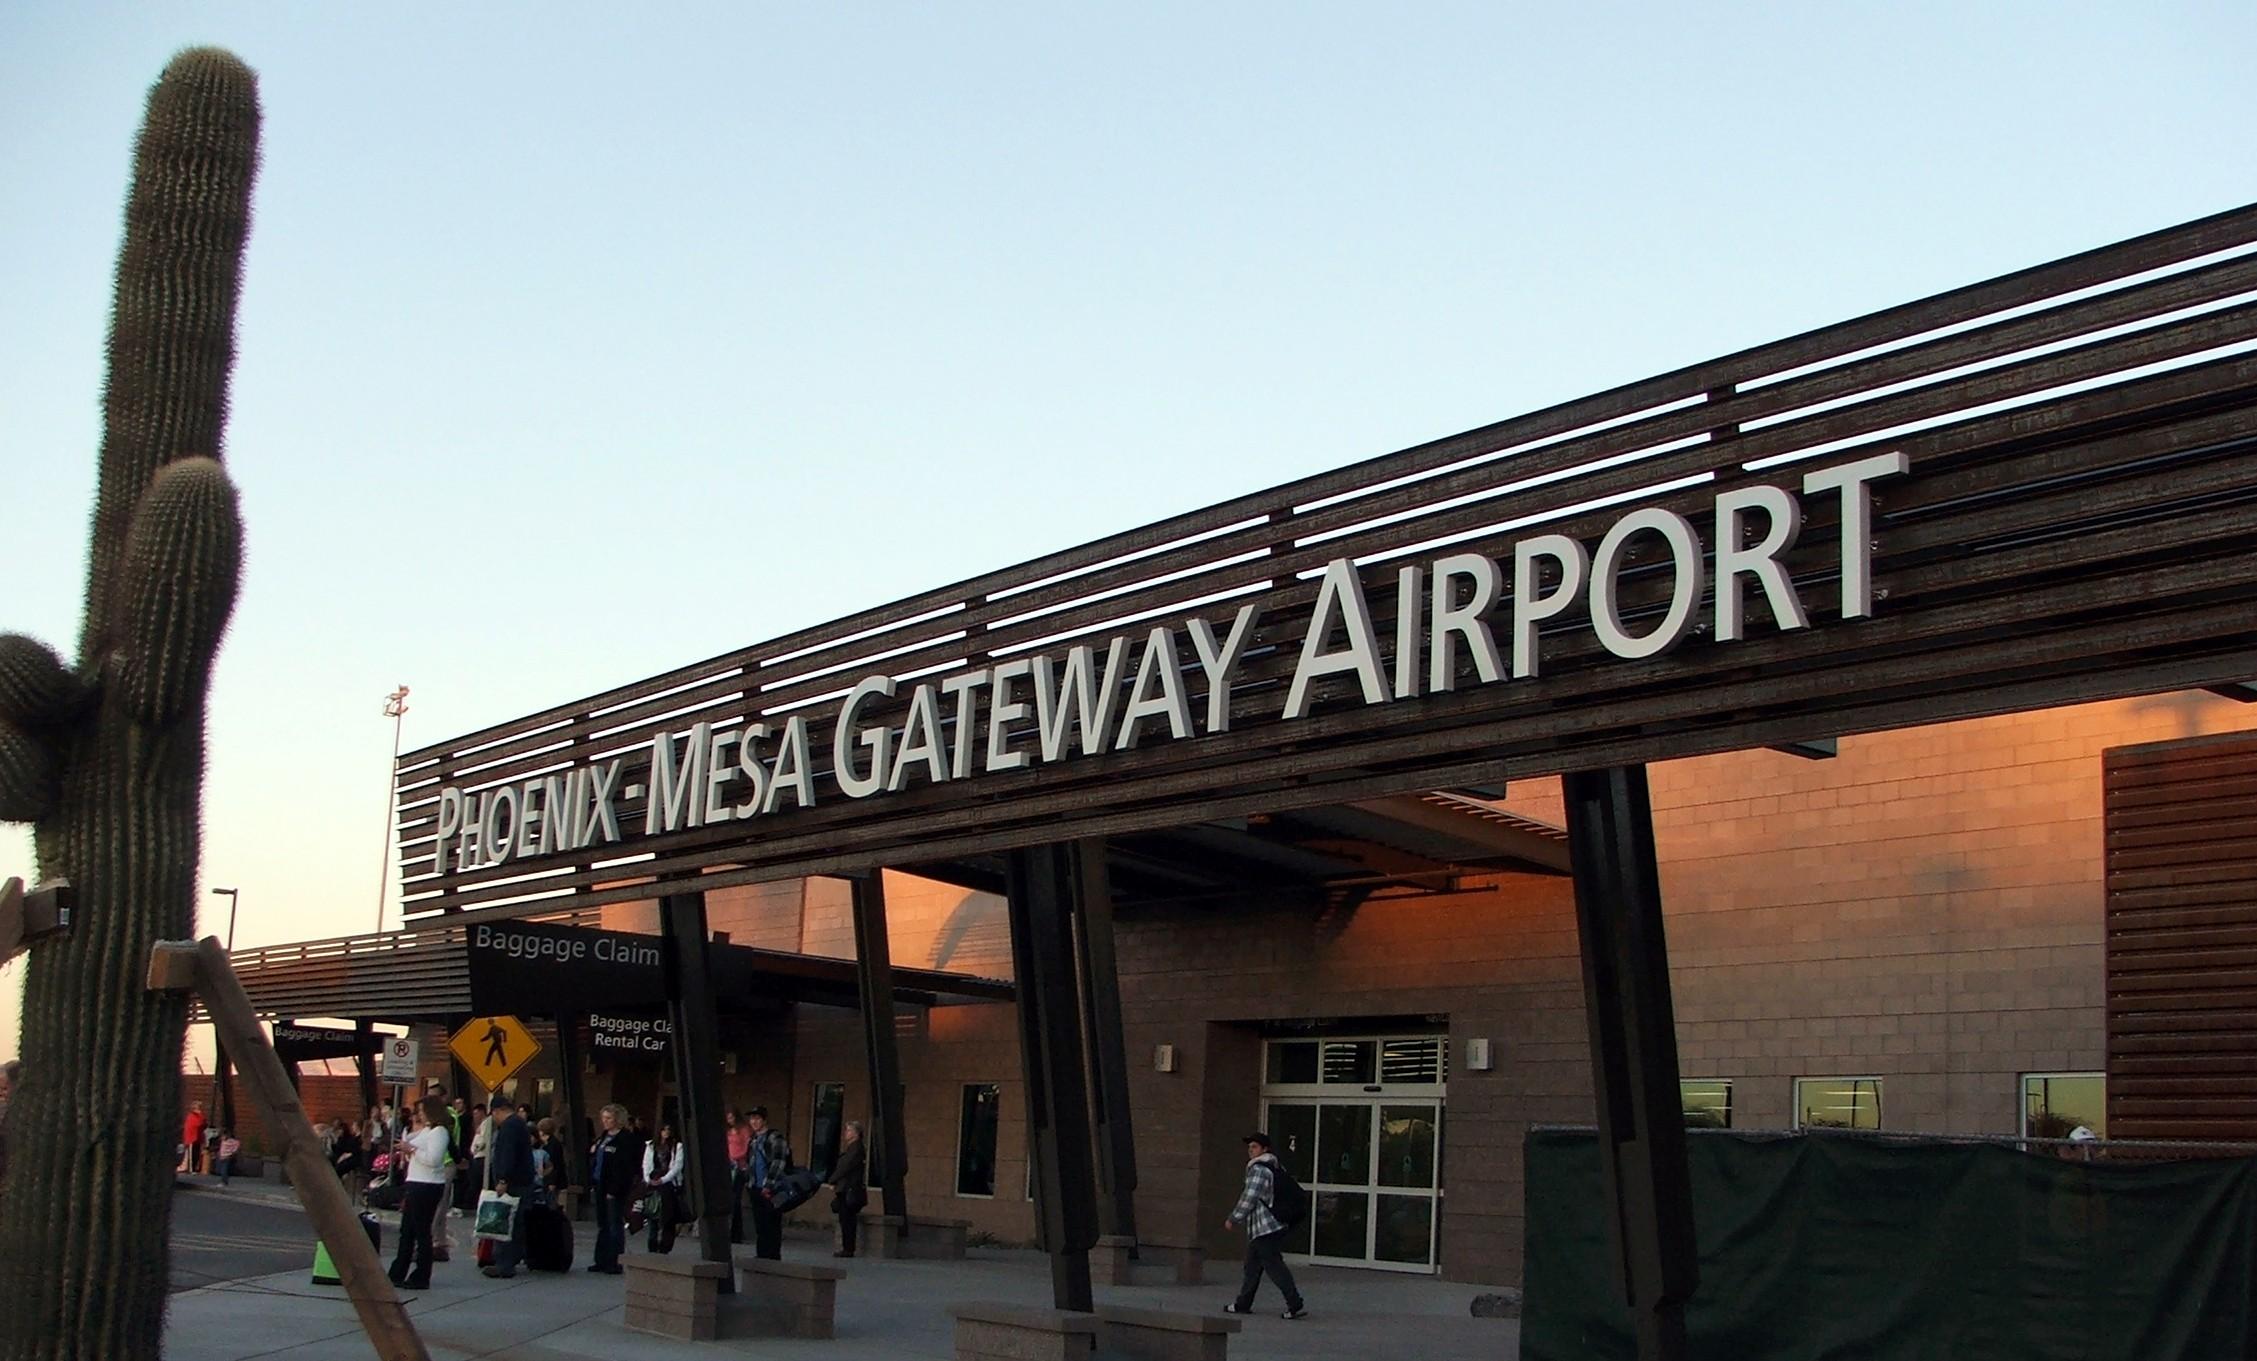 Phoenix Mesa Gateway Airport benefits Mesa Gilbert Gold